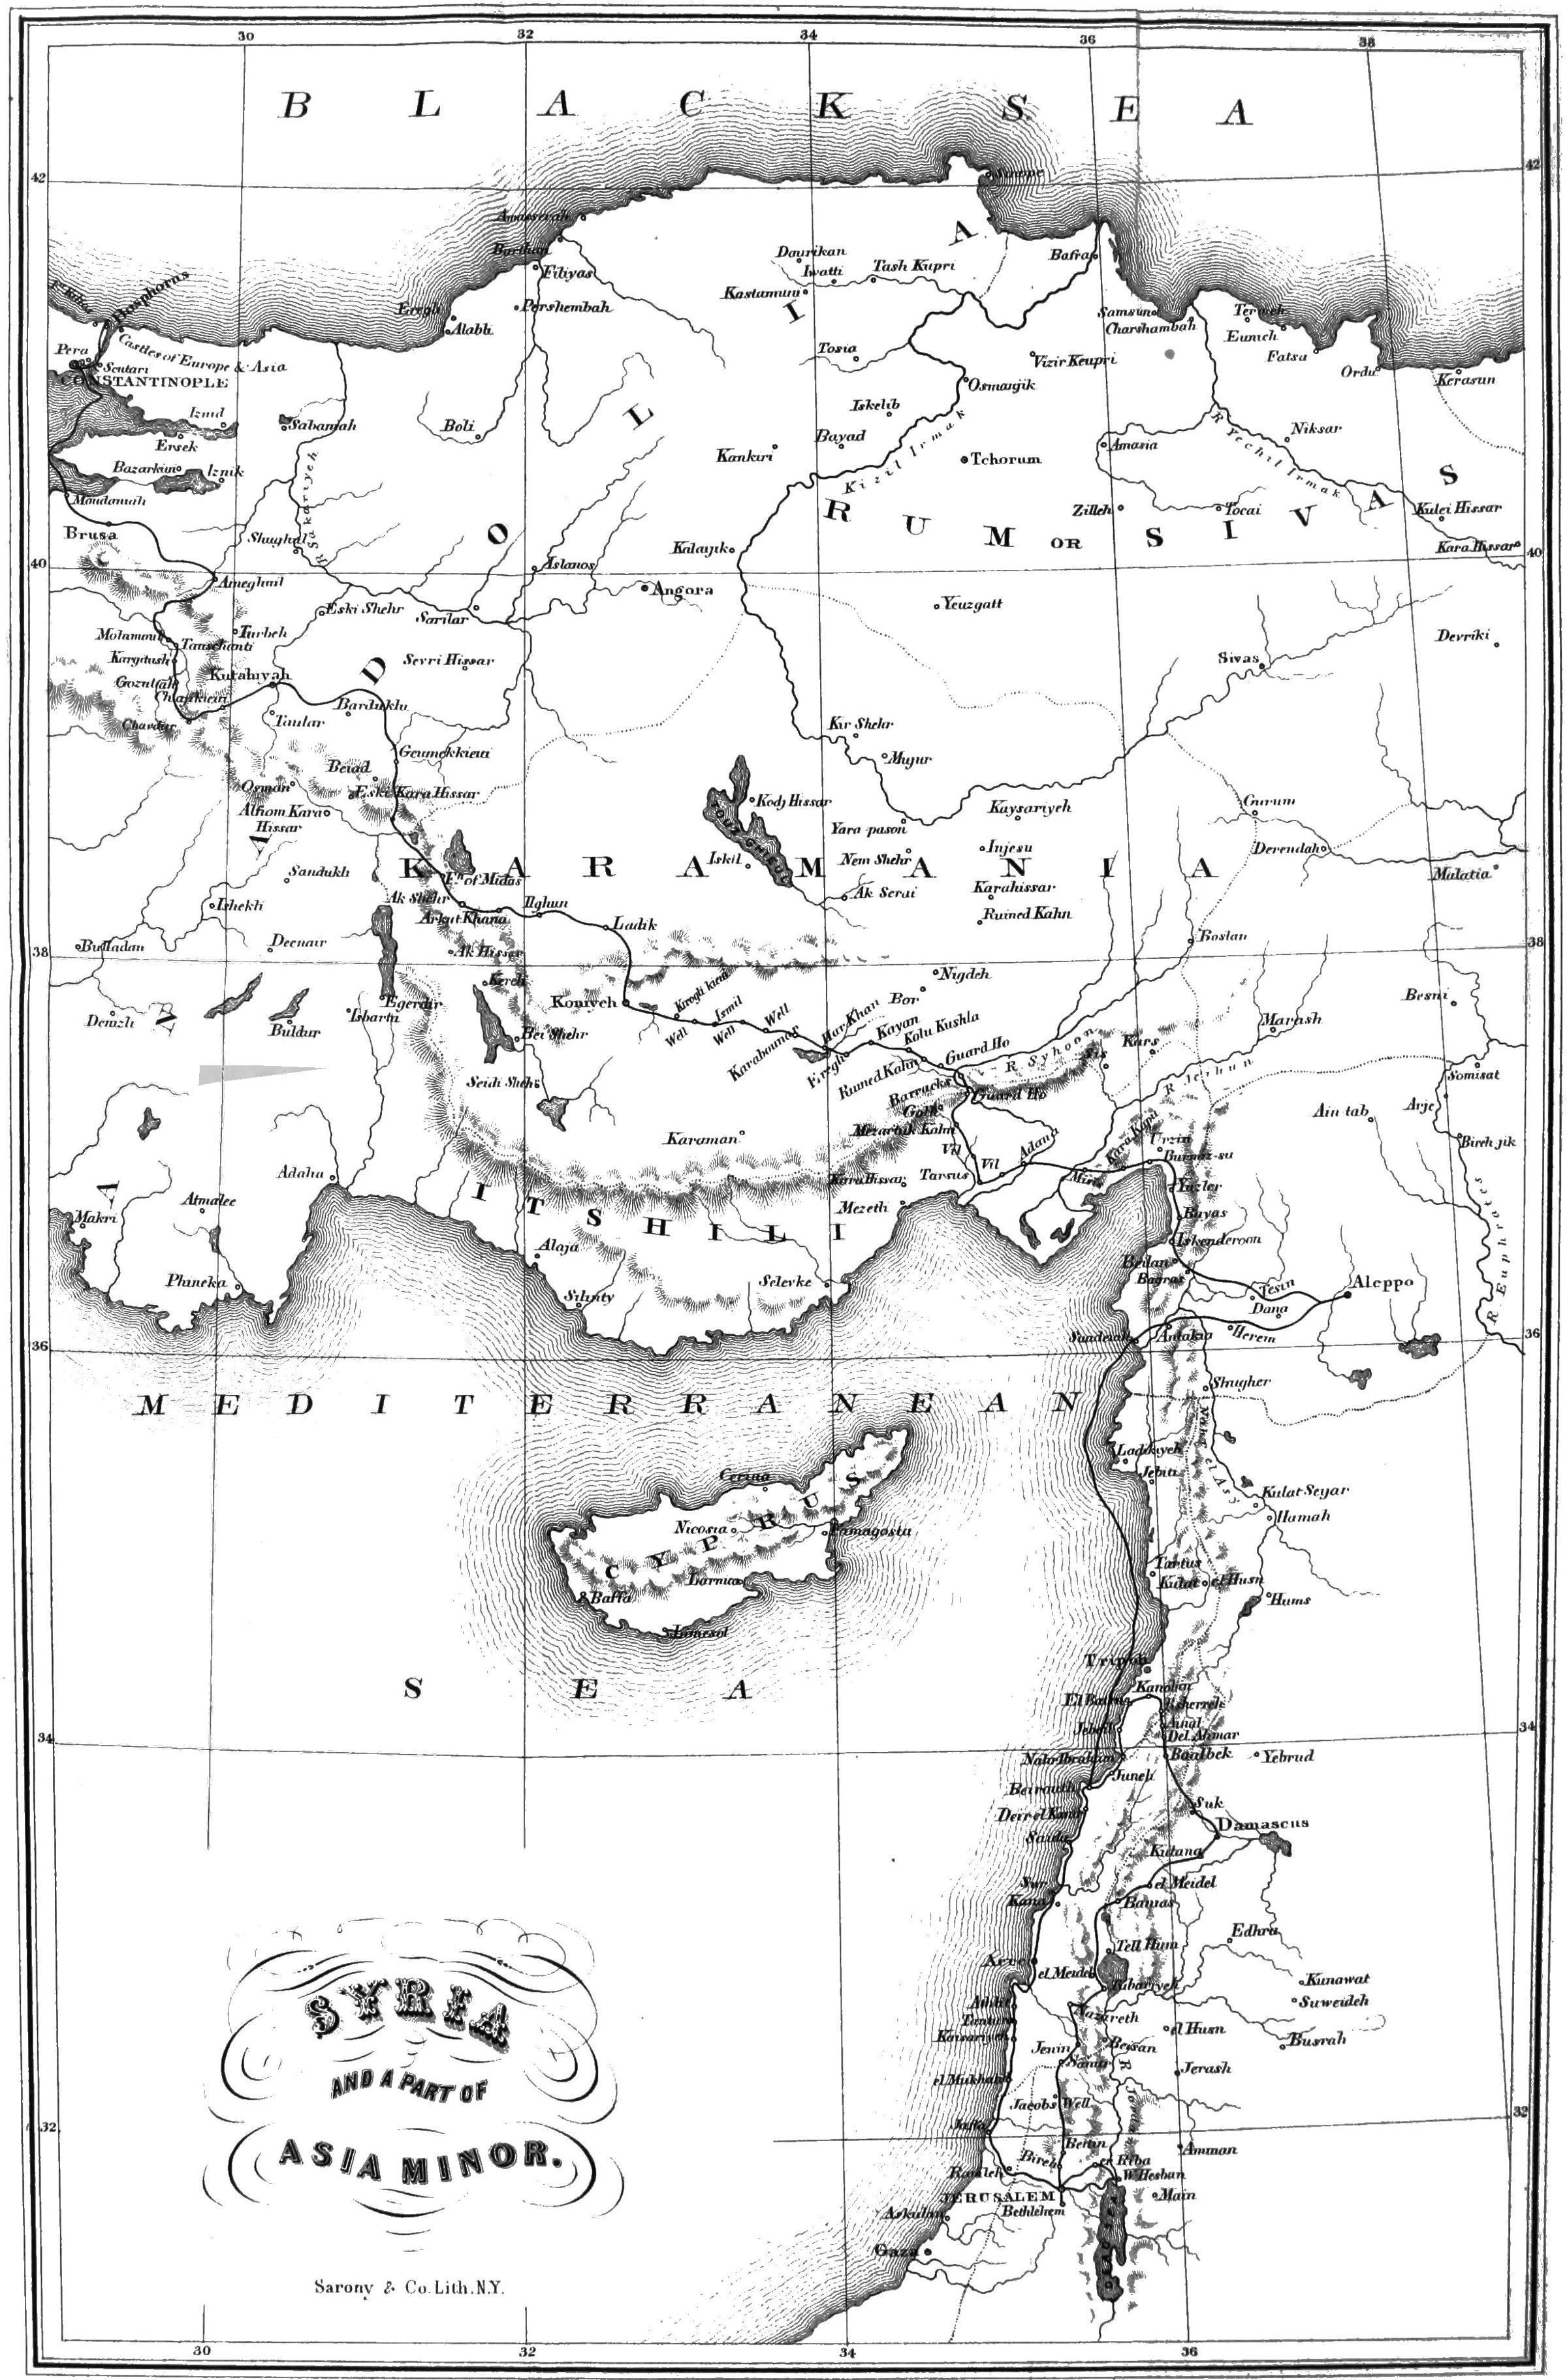 First Century Asia Minor Map